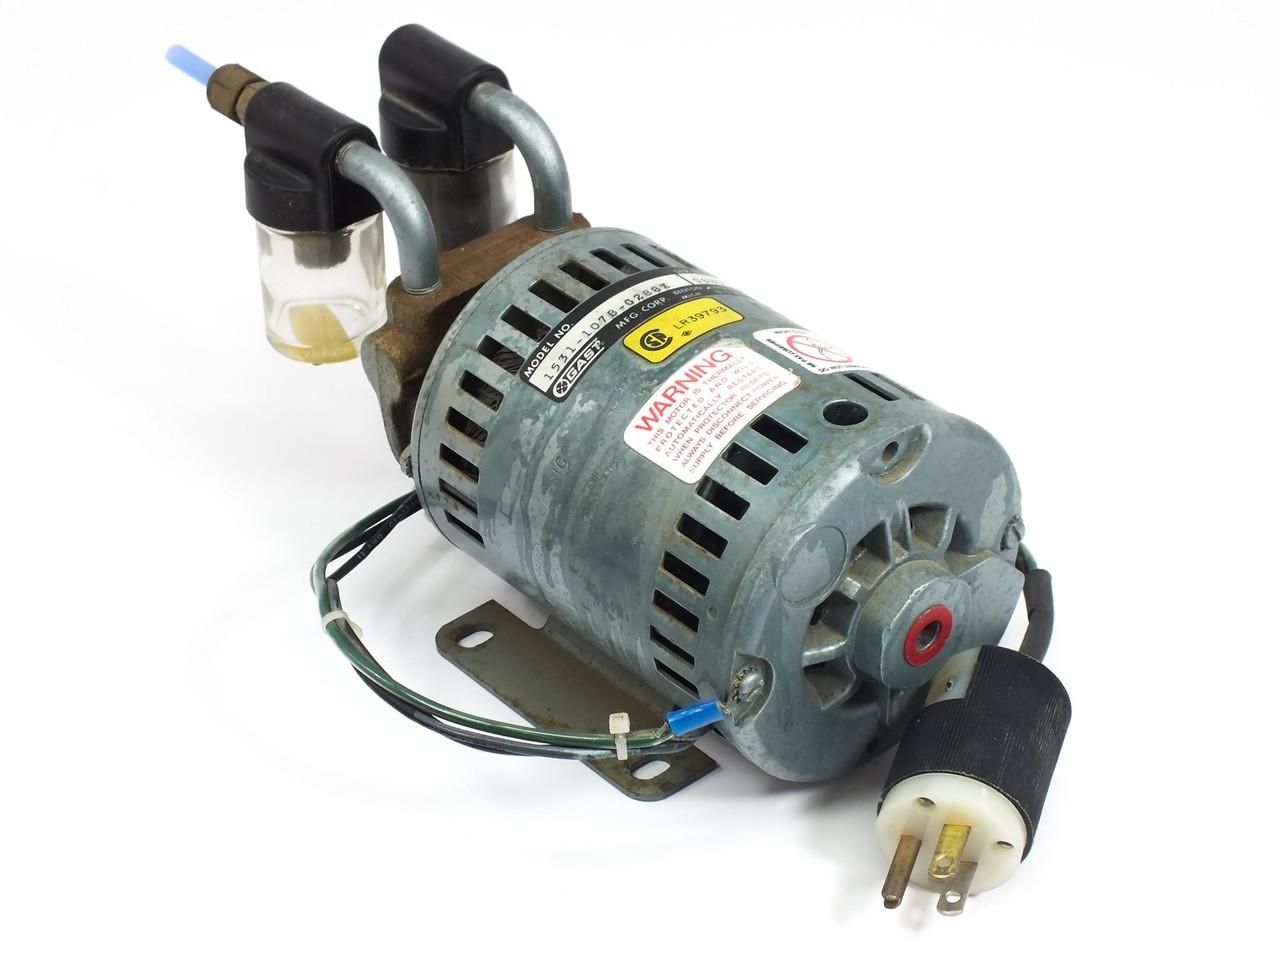 Gast Vacuum Pumps Wiring Diagram Library Pump 1 10 Hp Rotary Vane 1531 107b G288x